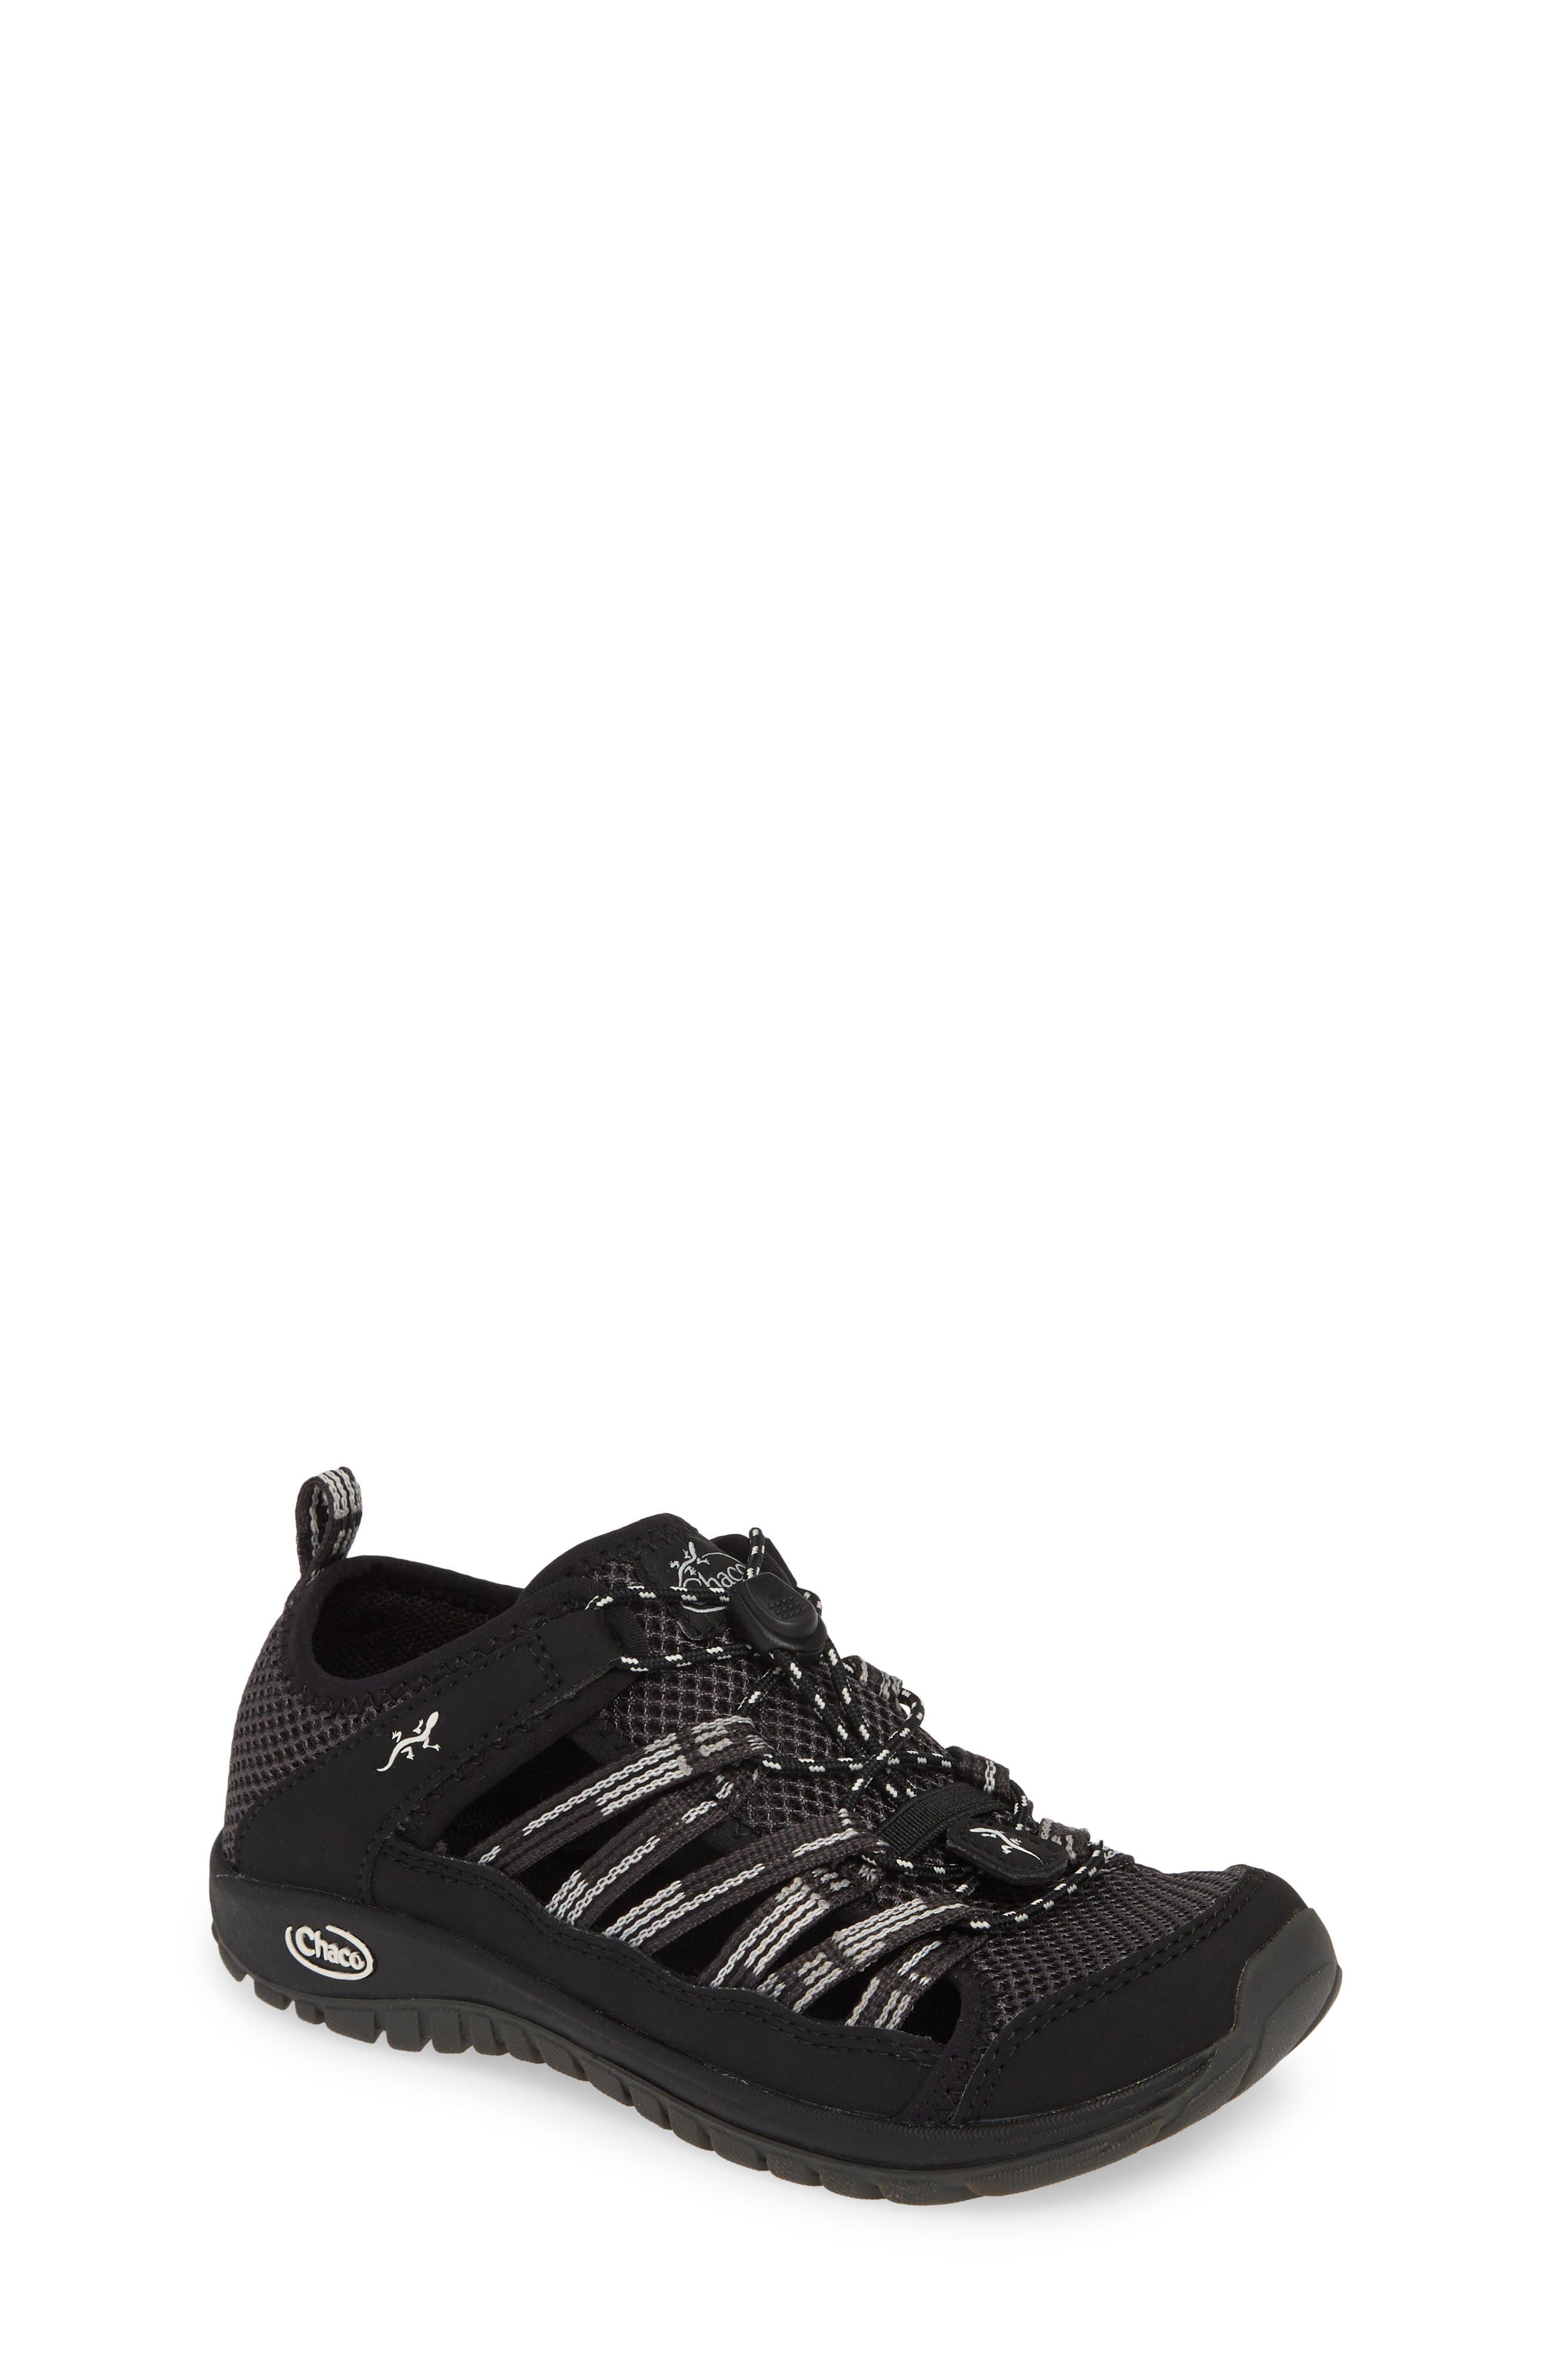 Outcross 2 Water Sneaker, Main, color, PAVEMENT BLACK